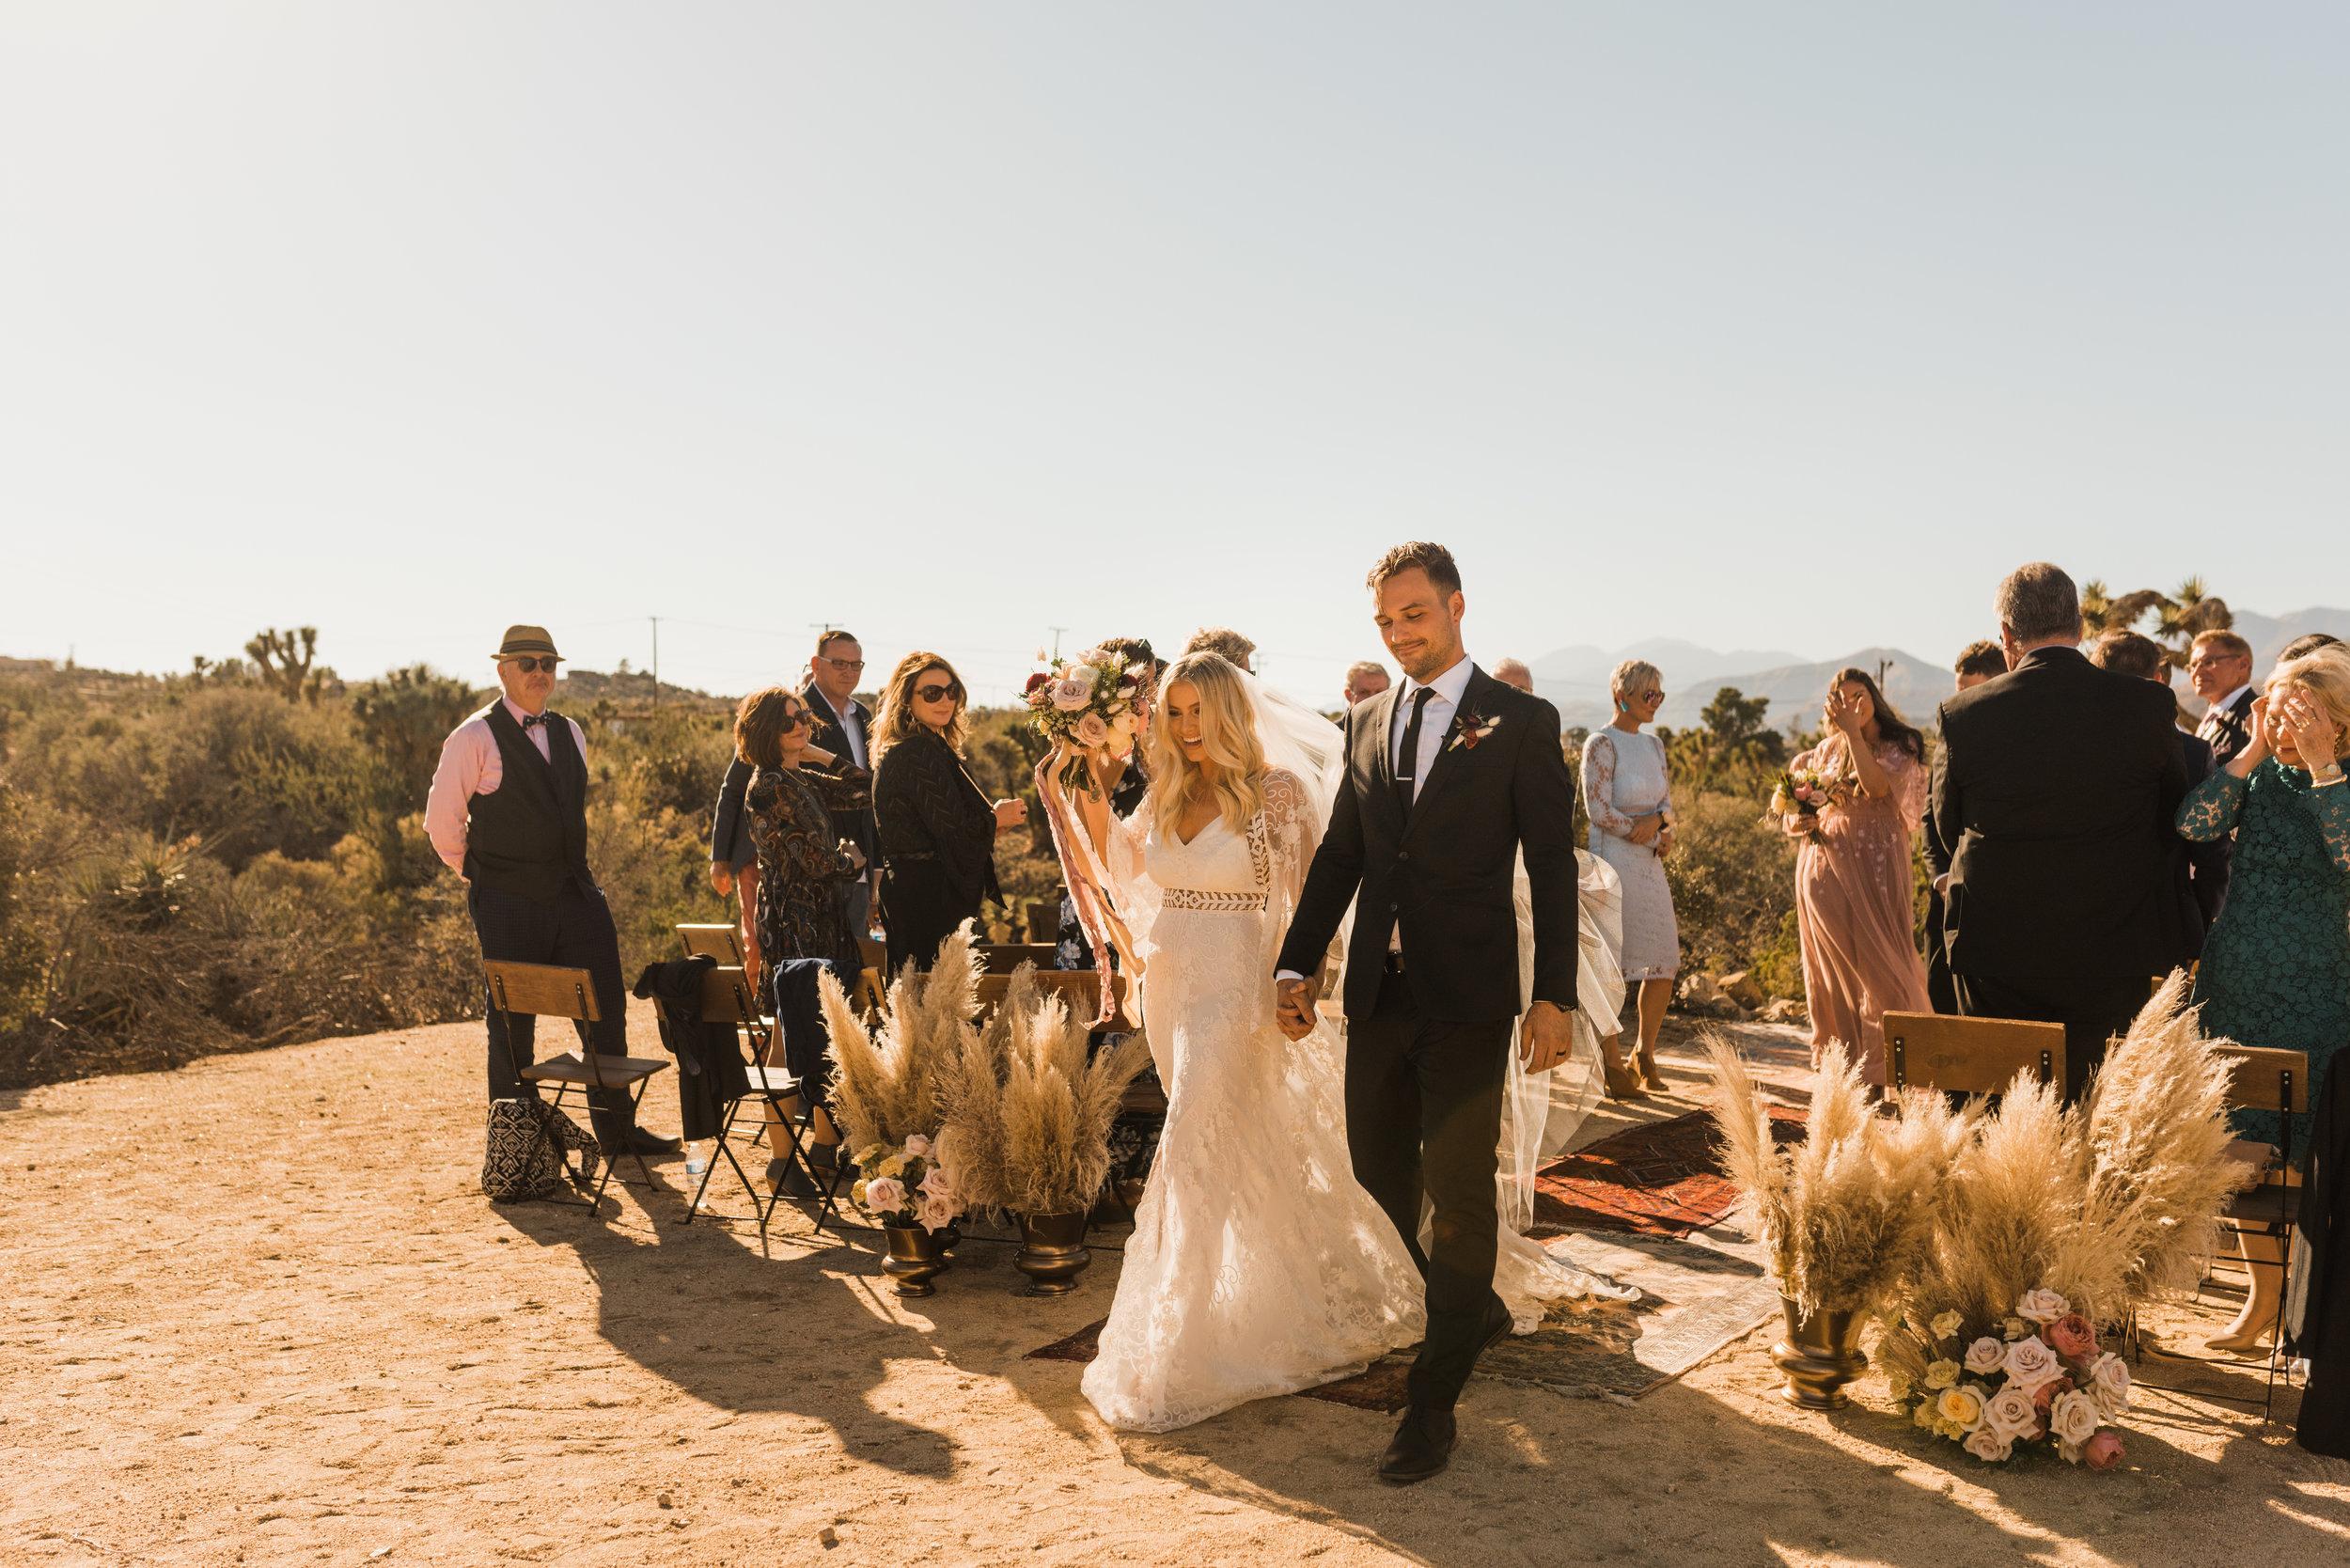 Intimate Wedding Ceremony in Joshua Tree, California